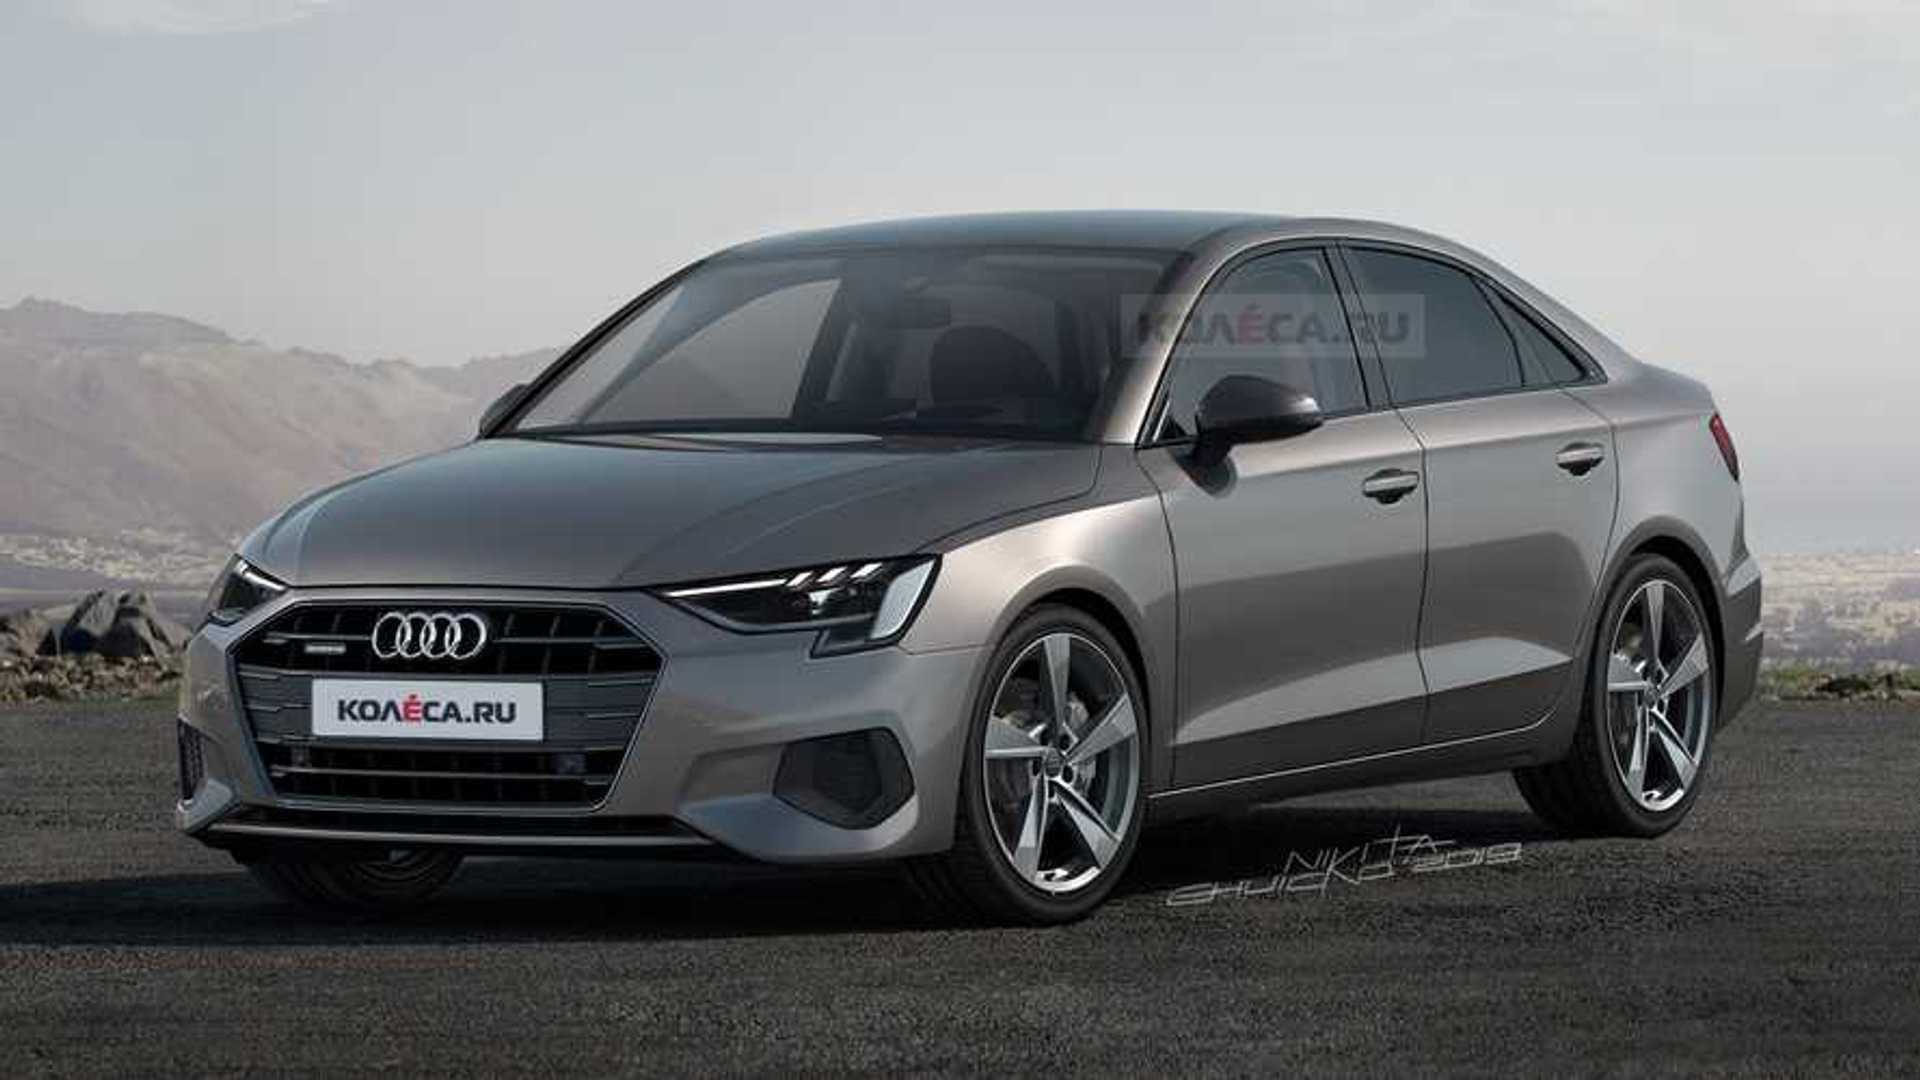 New Audi A3 Sedan Rendered Based On The Latest Spy Shots